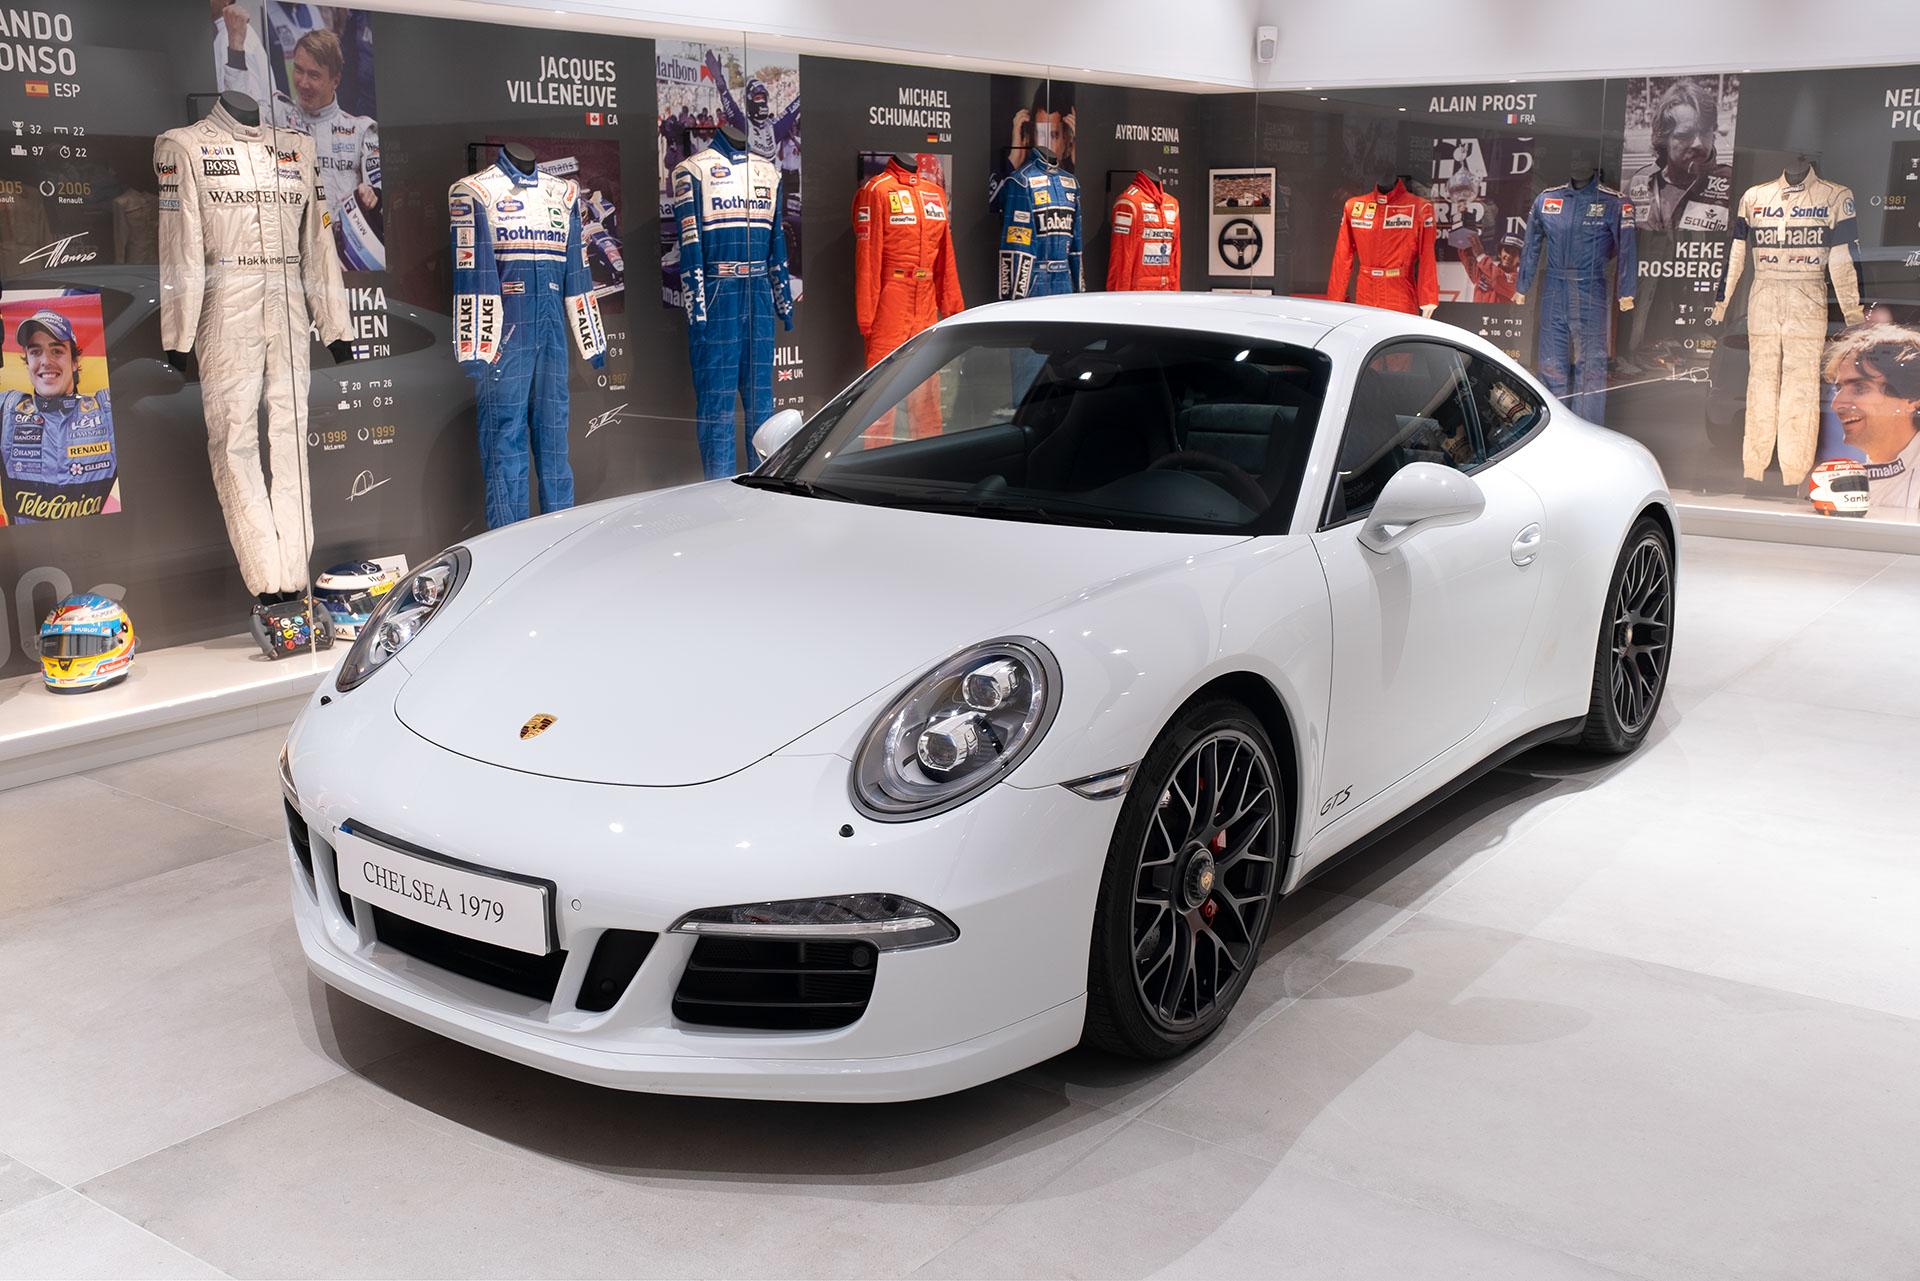 DSCF0150 1 Porsche 911 CARRERA 4GTS